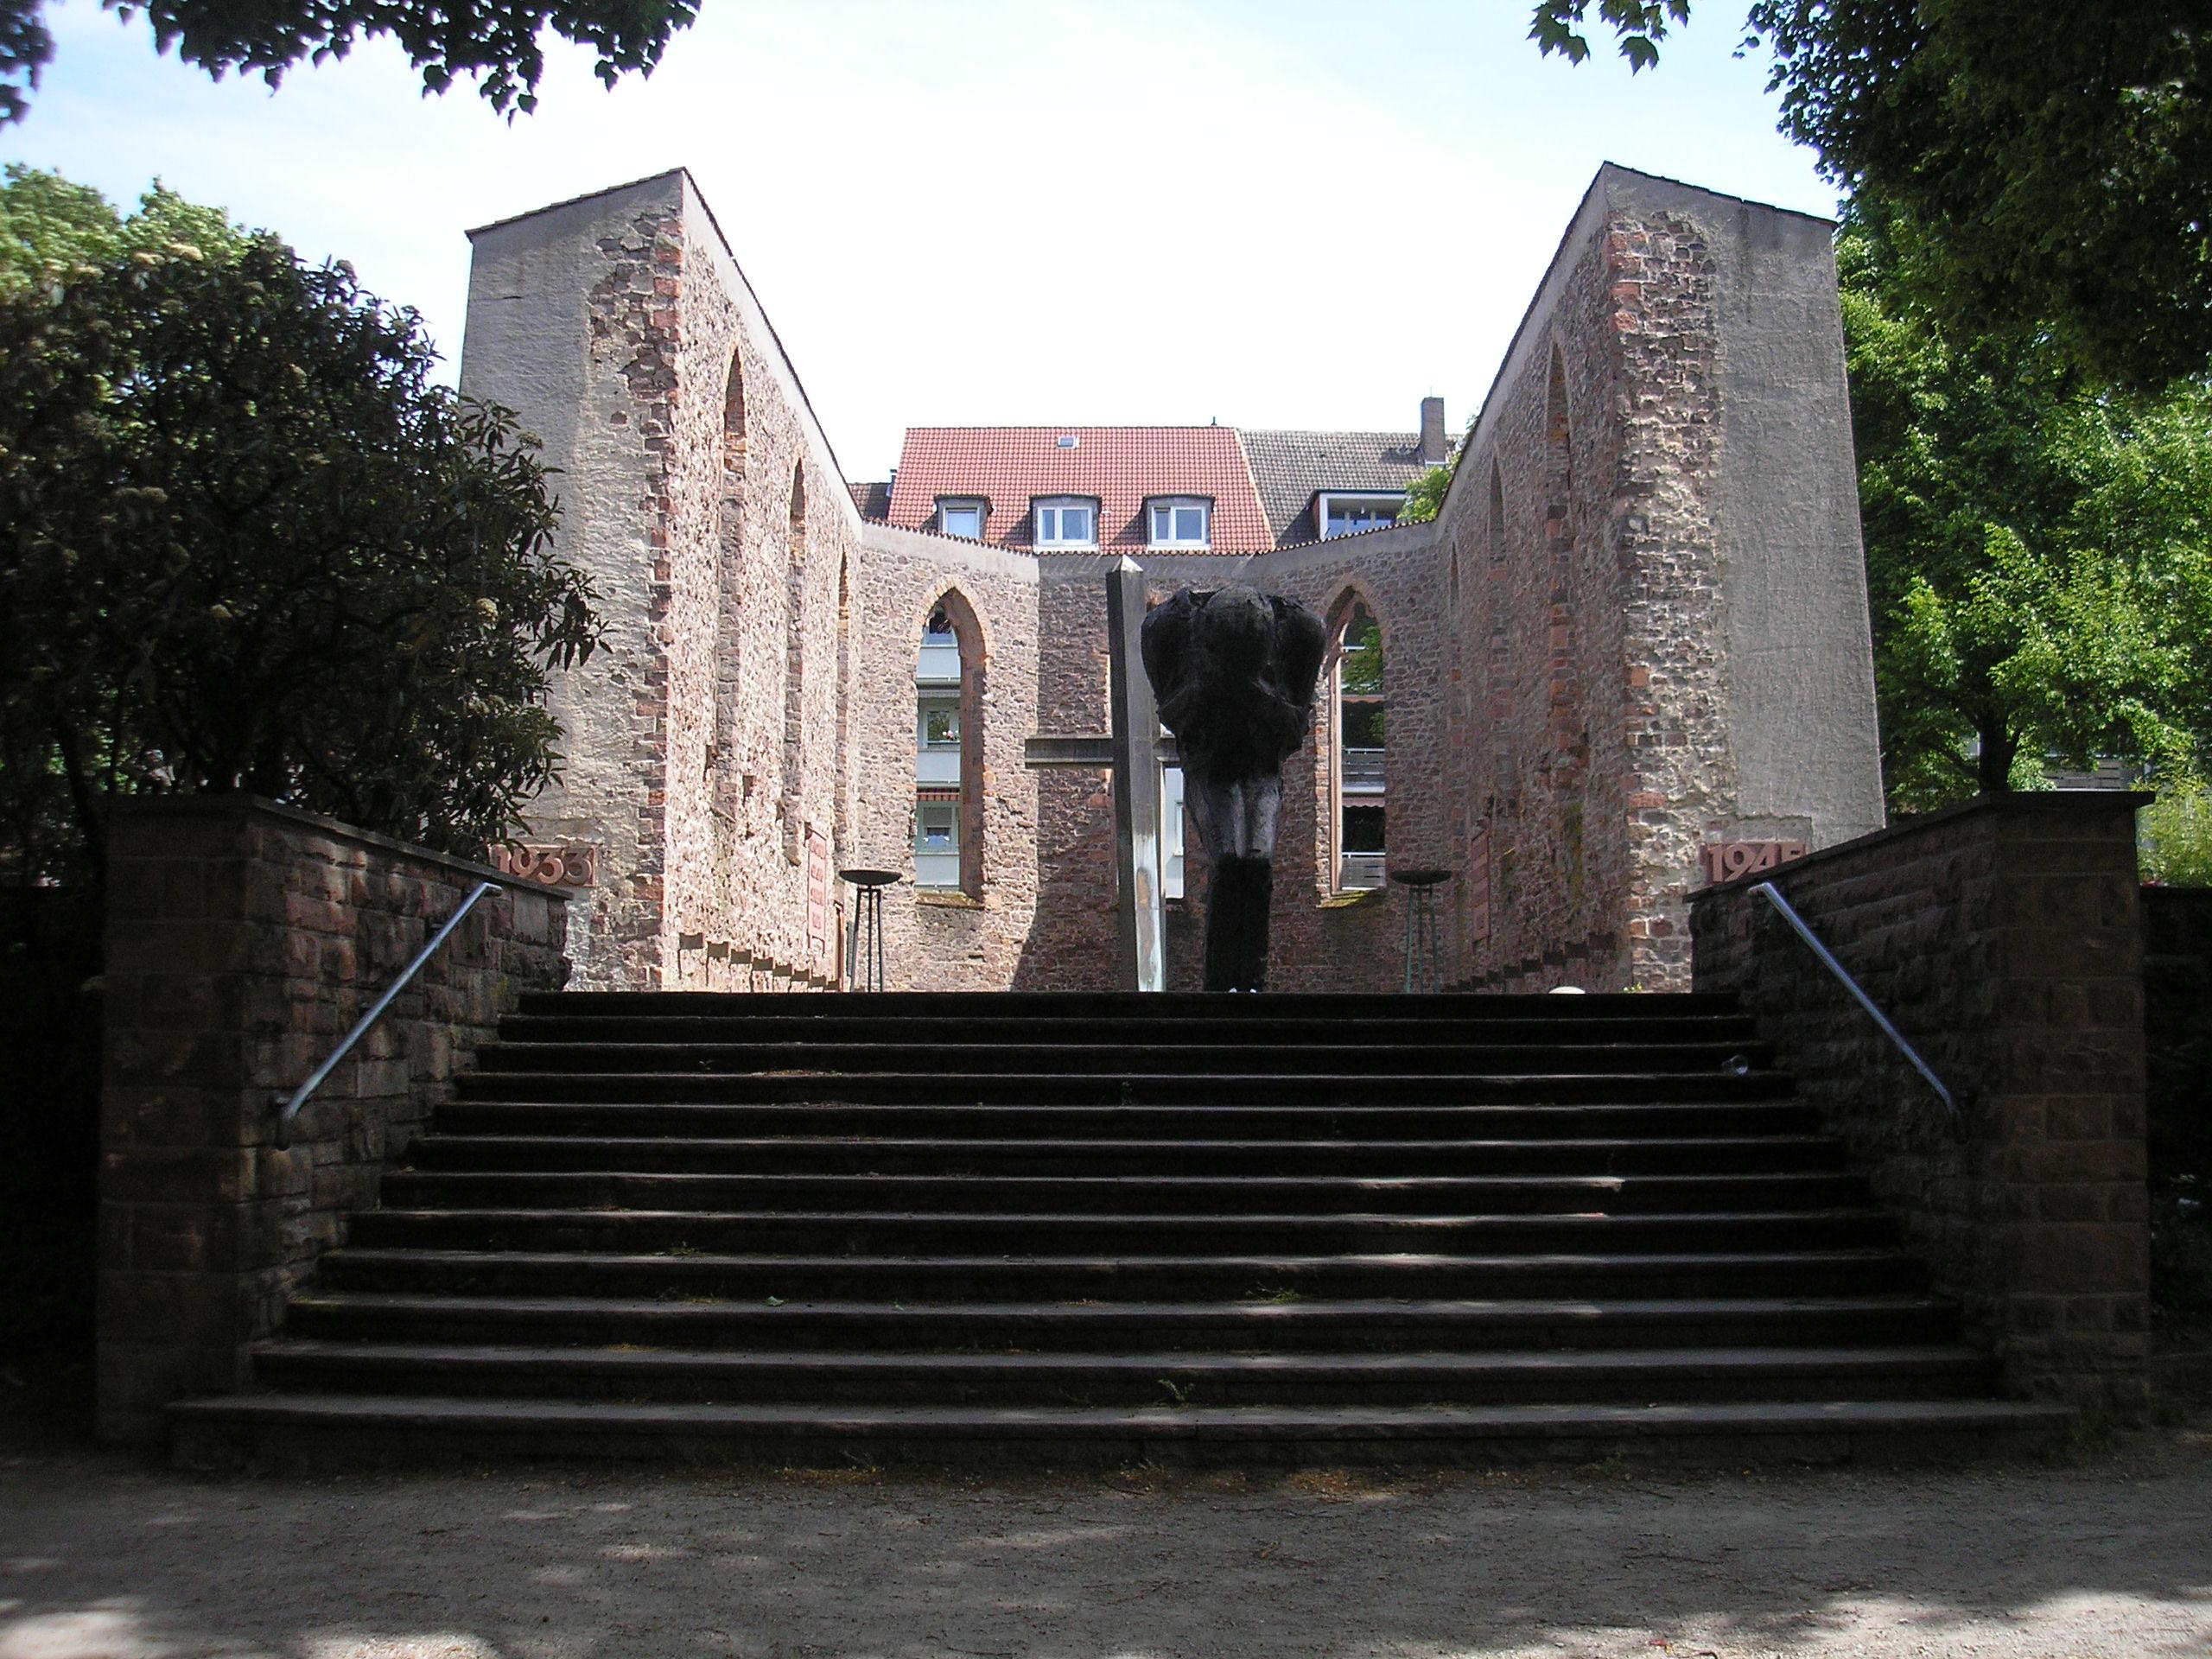 Frauen aus Ahrensburg